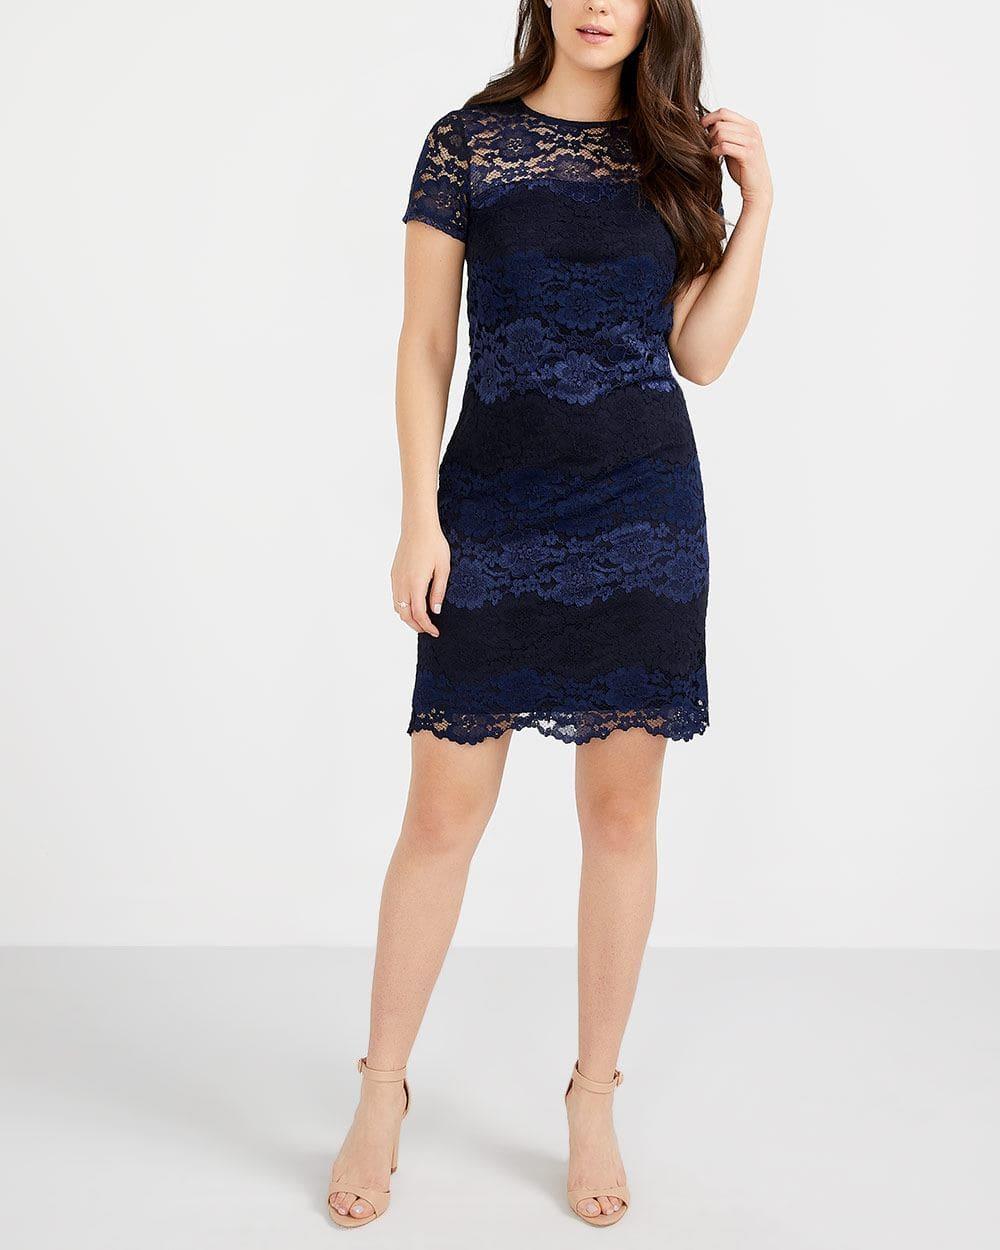 Lace Striped Bodycon Dress